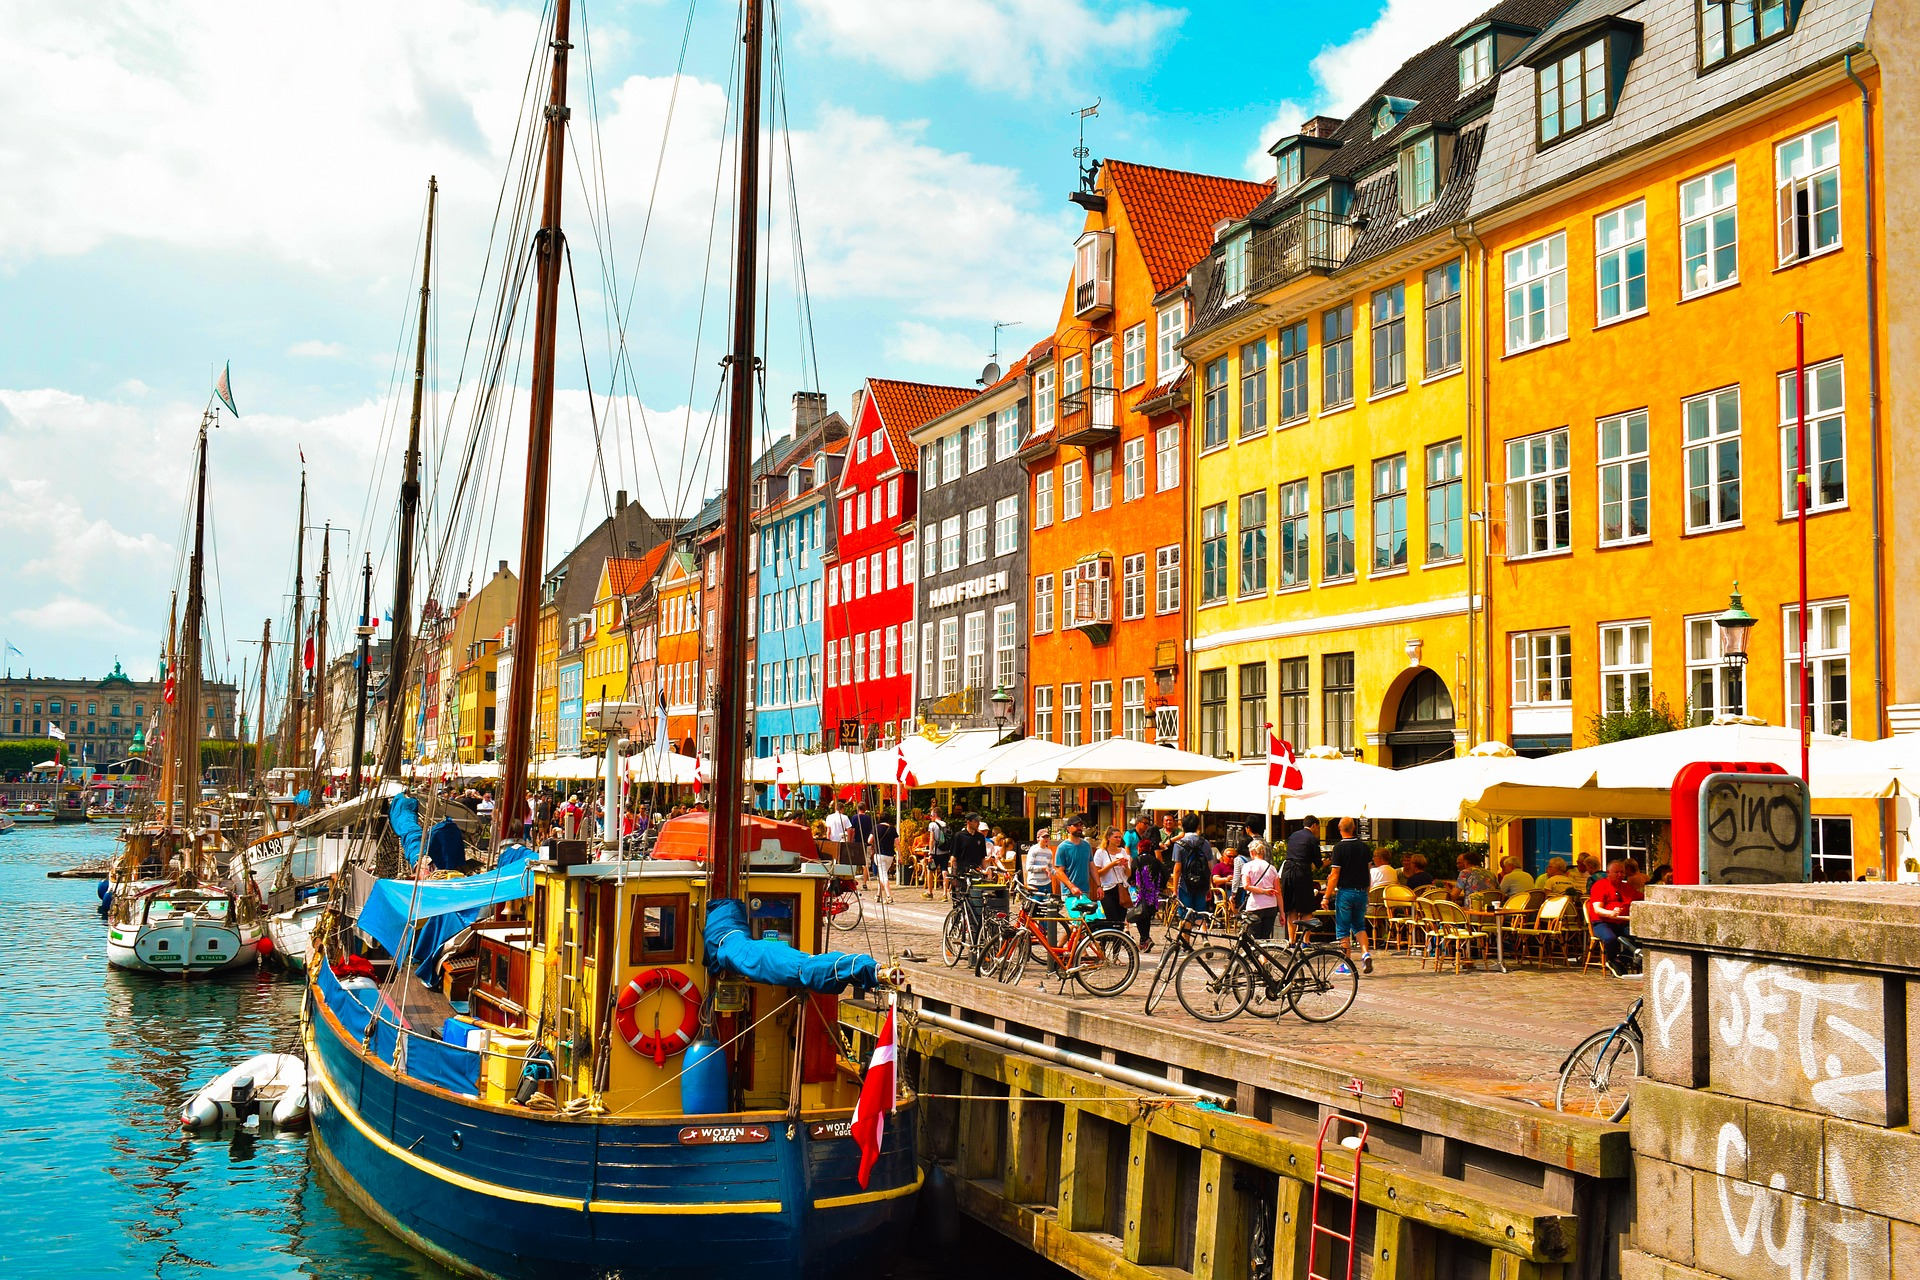 Copenhague_1_CC0.jpg?1545661029